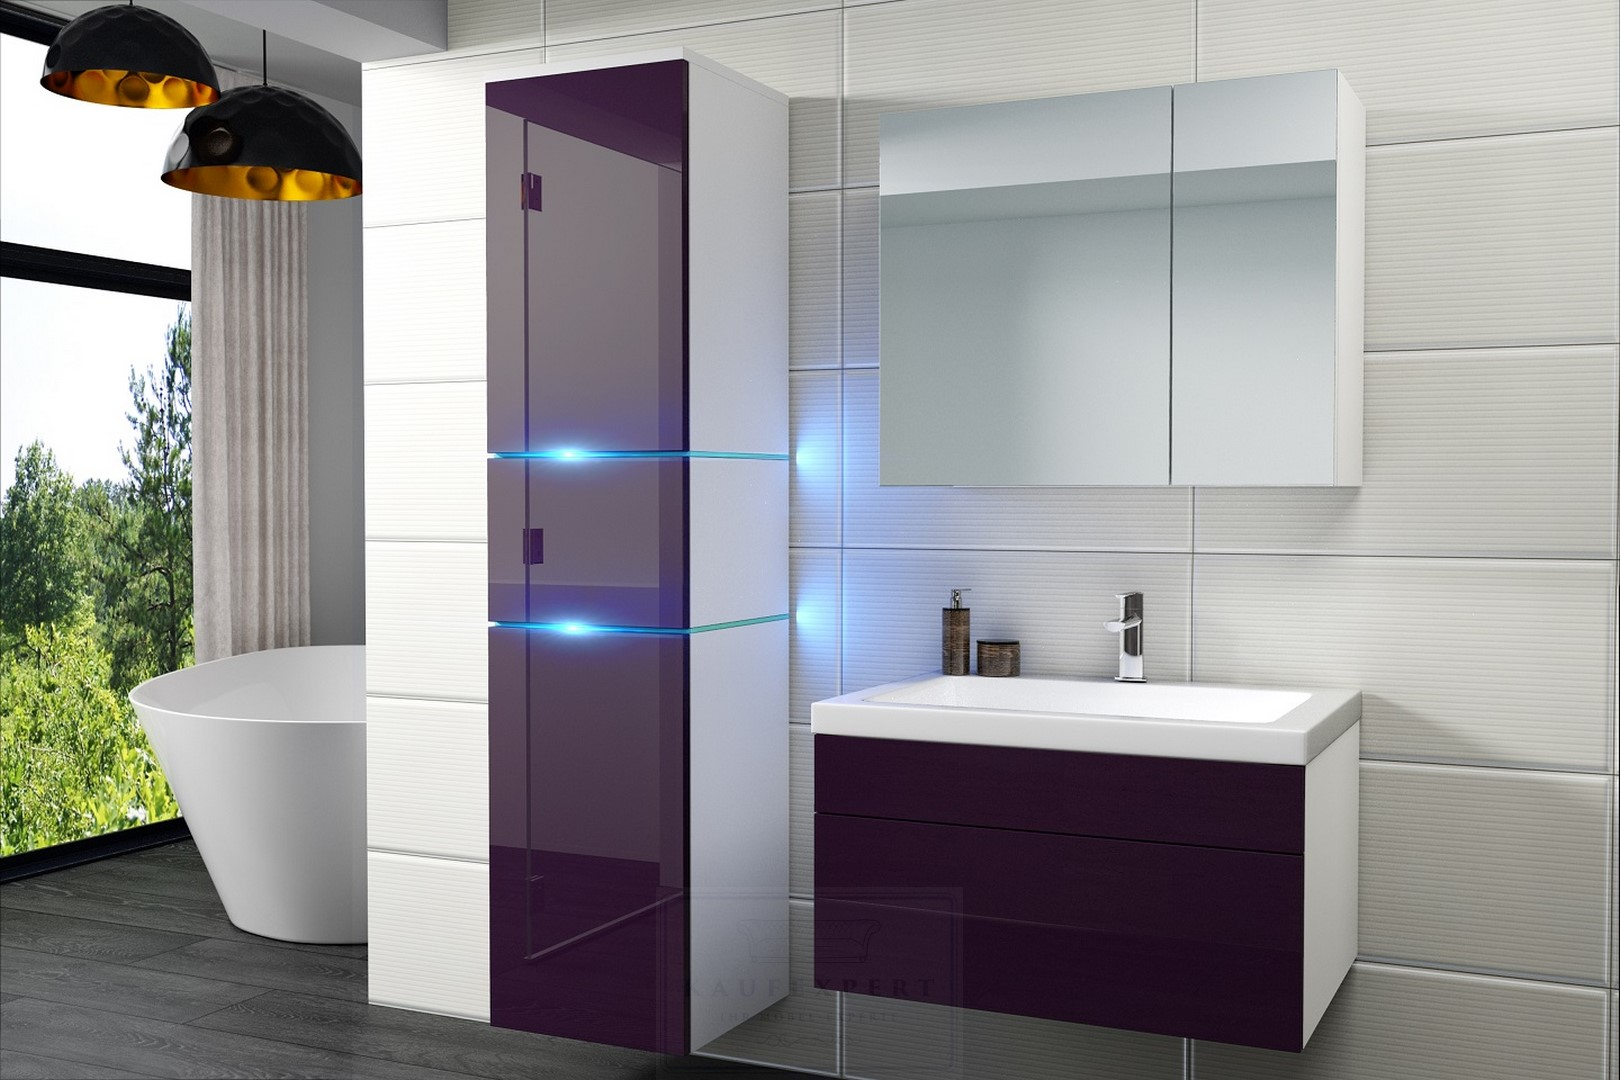 badm bel set ledox 170 aubergine hochglanz wei. Black Bedroom Furniture Sets. Home Design Ideas